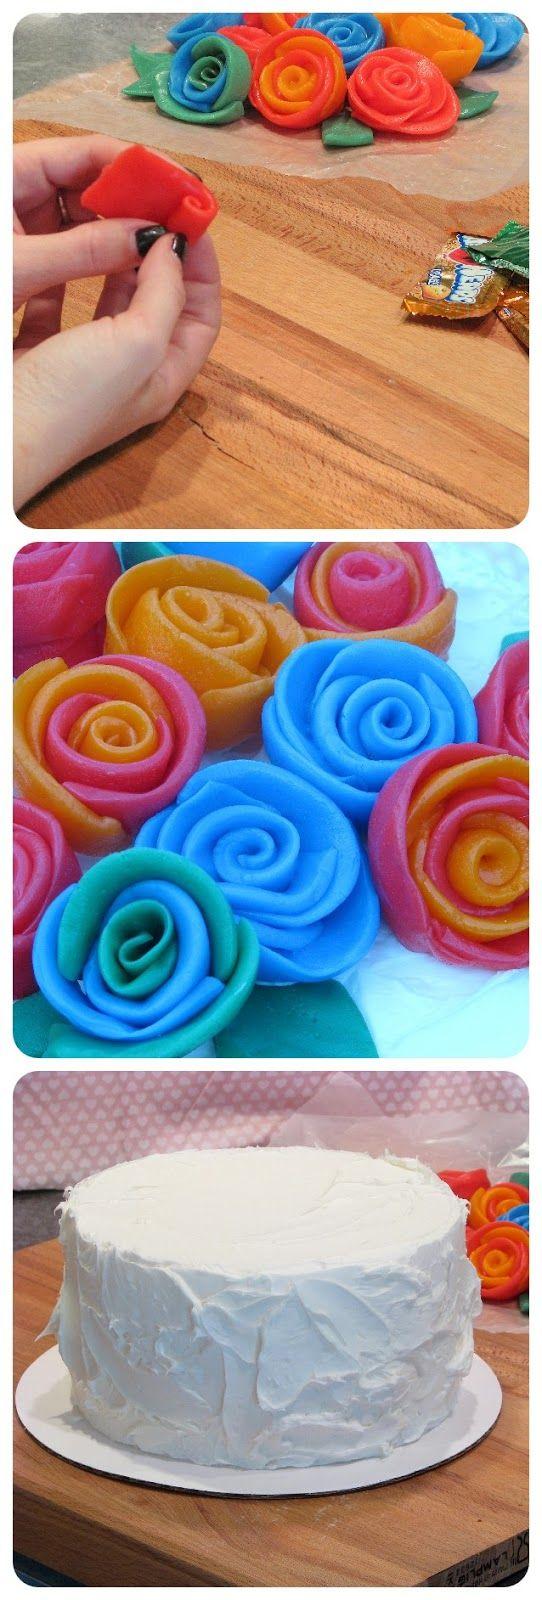 airheads rose cake diy - helllooooo valentine!